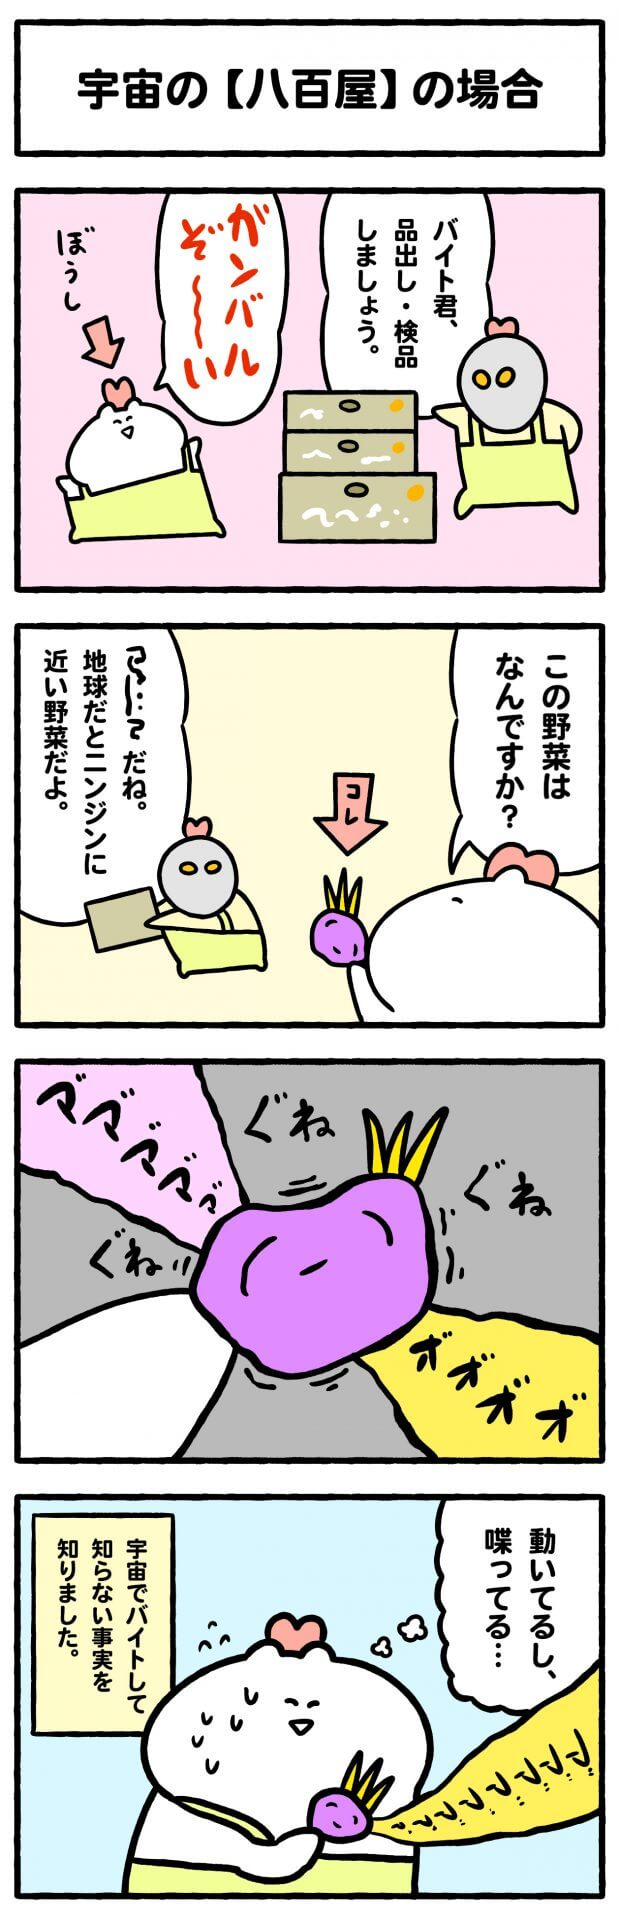 study_Vegetables